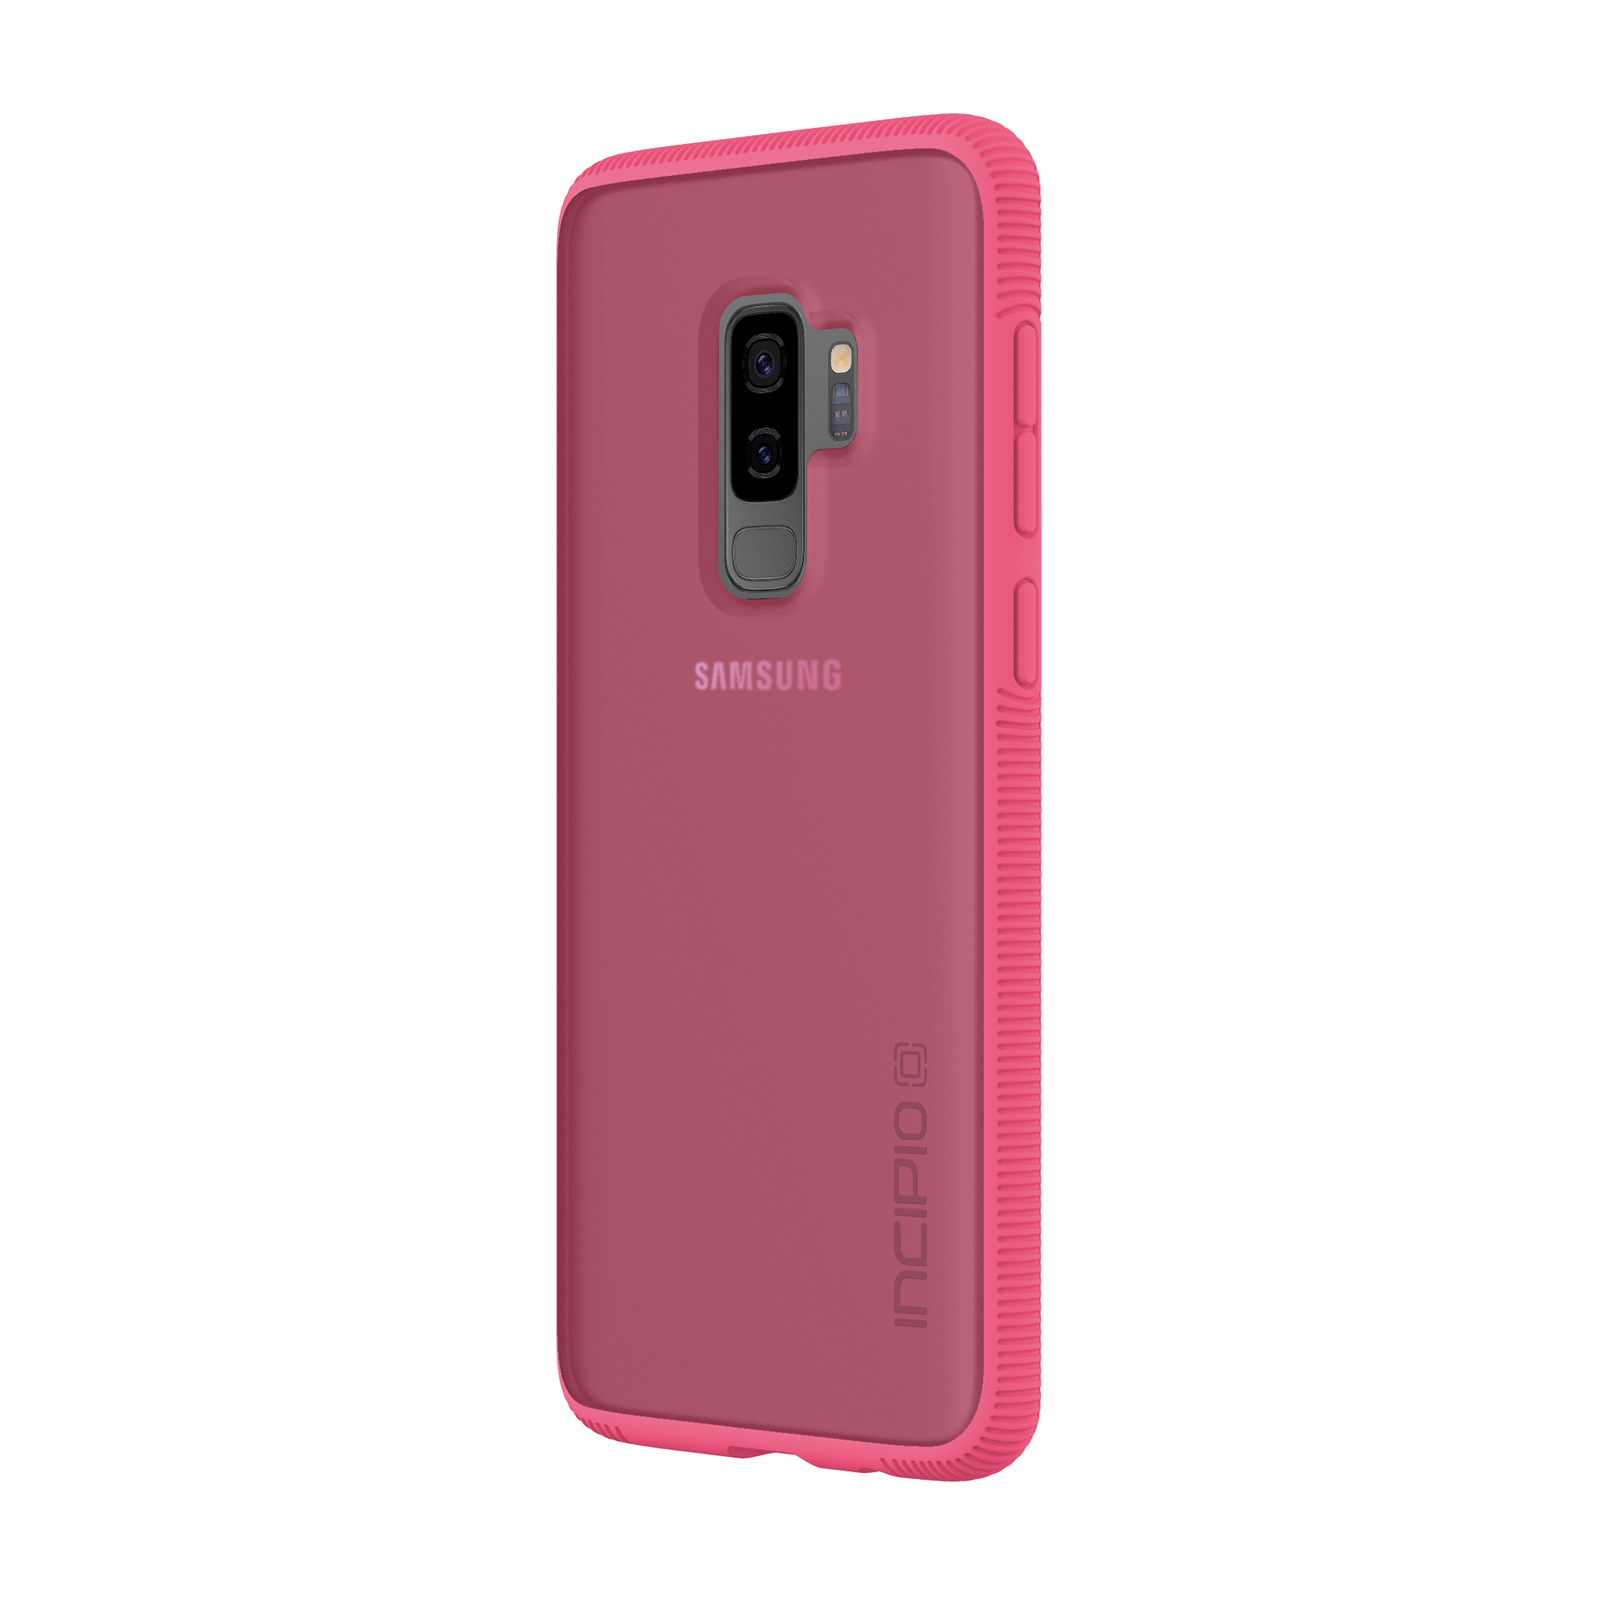 Incipio: Octane for Samsung Galaxy S9+ - Electric Pink